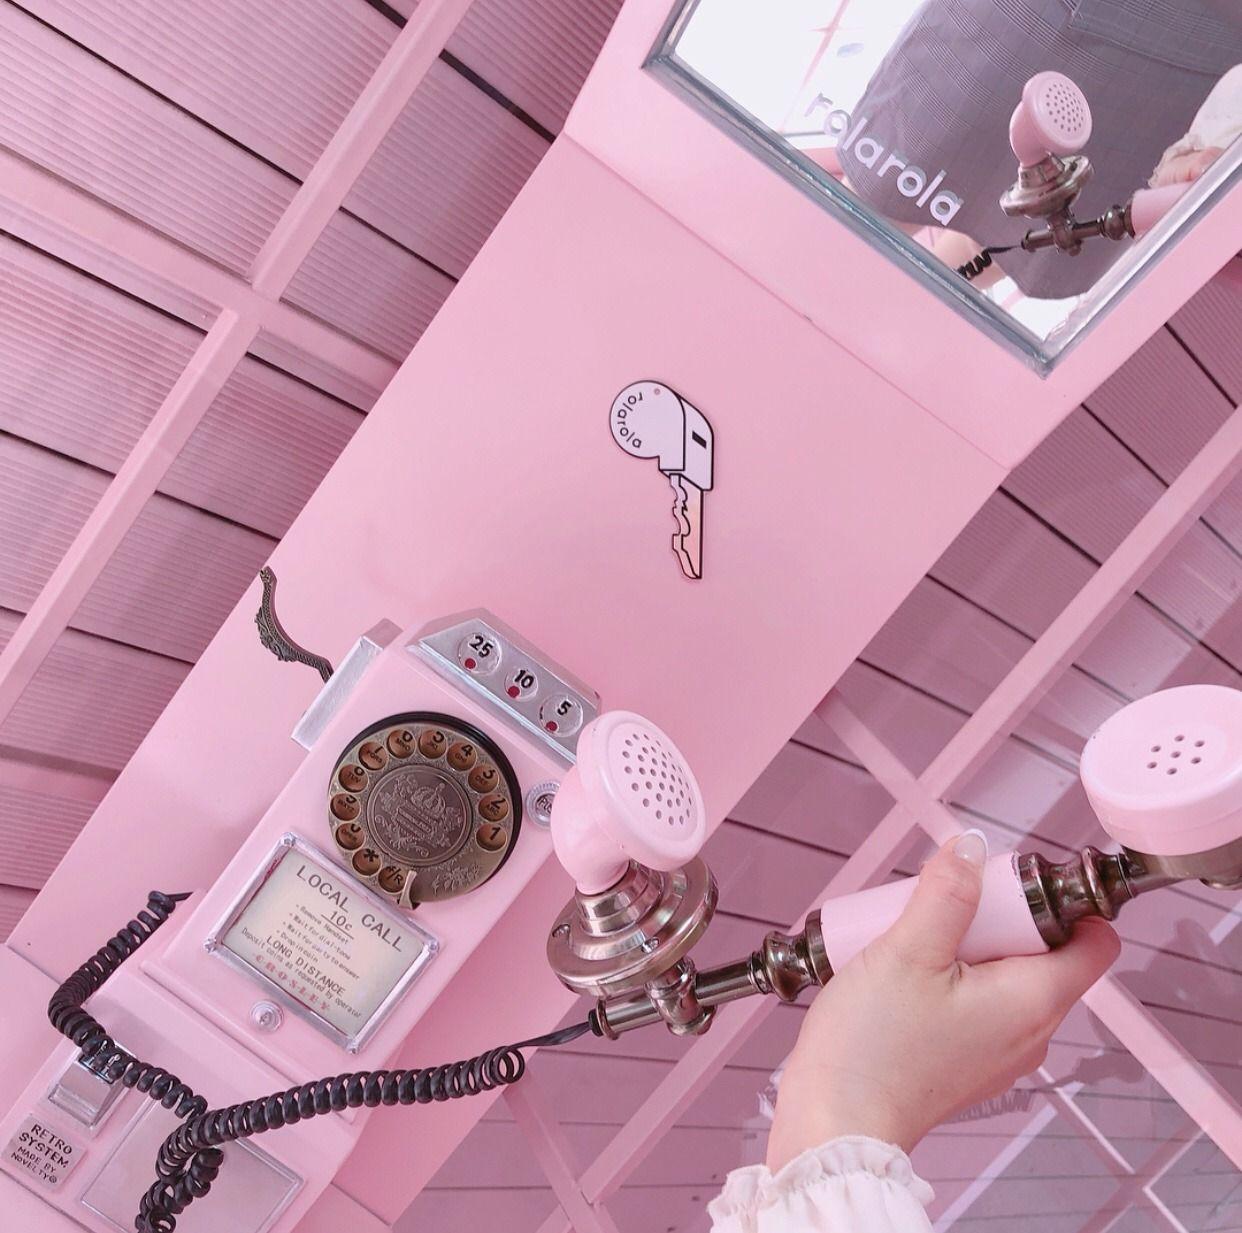 Chuucutie Https Instagram Com P Bh2cecjgrws Baby Pink Aesthetic Pastel Pink Aesthetic Pink Tumblr Aesthetic